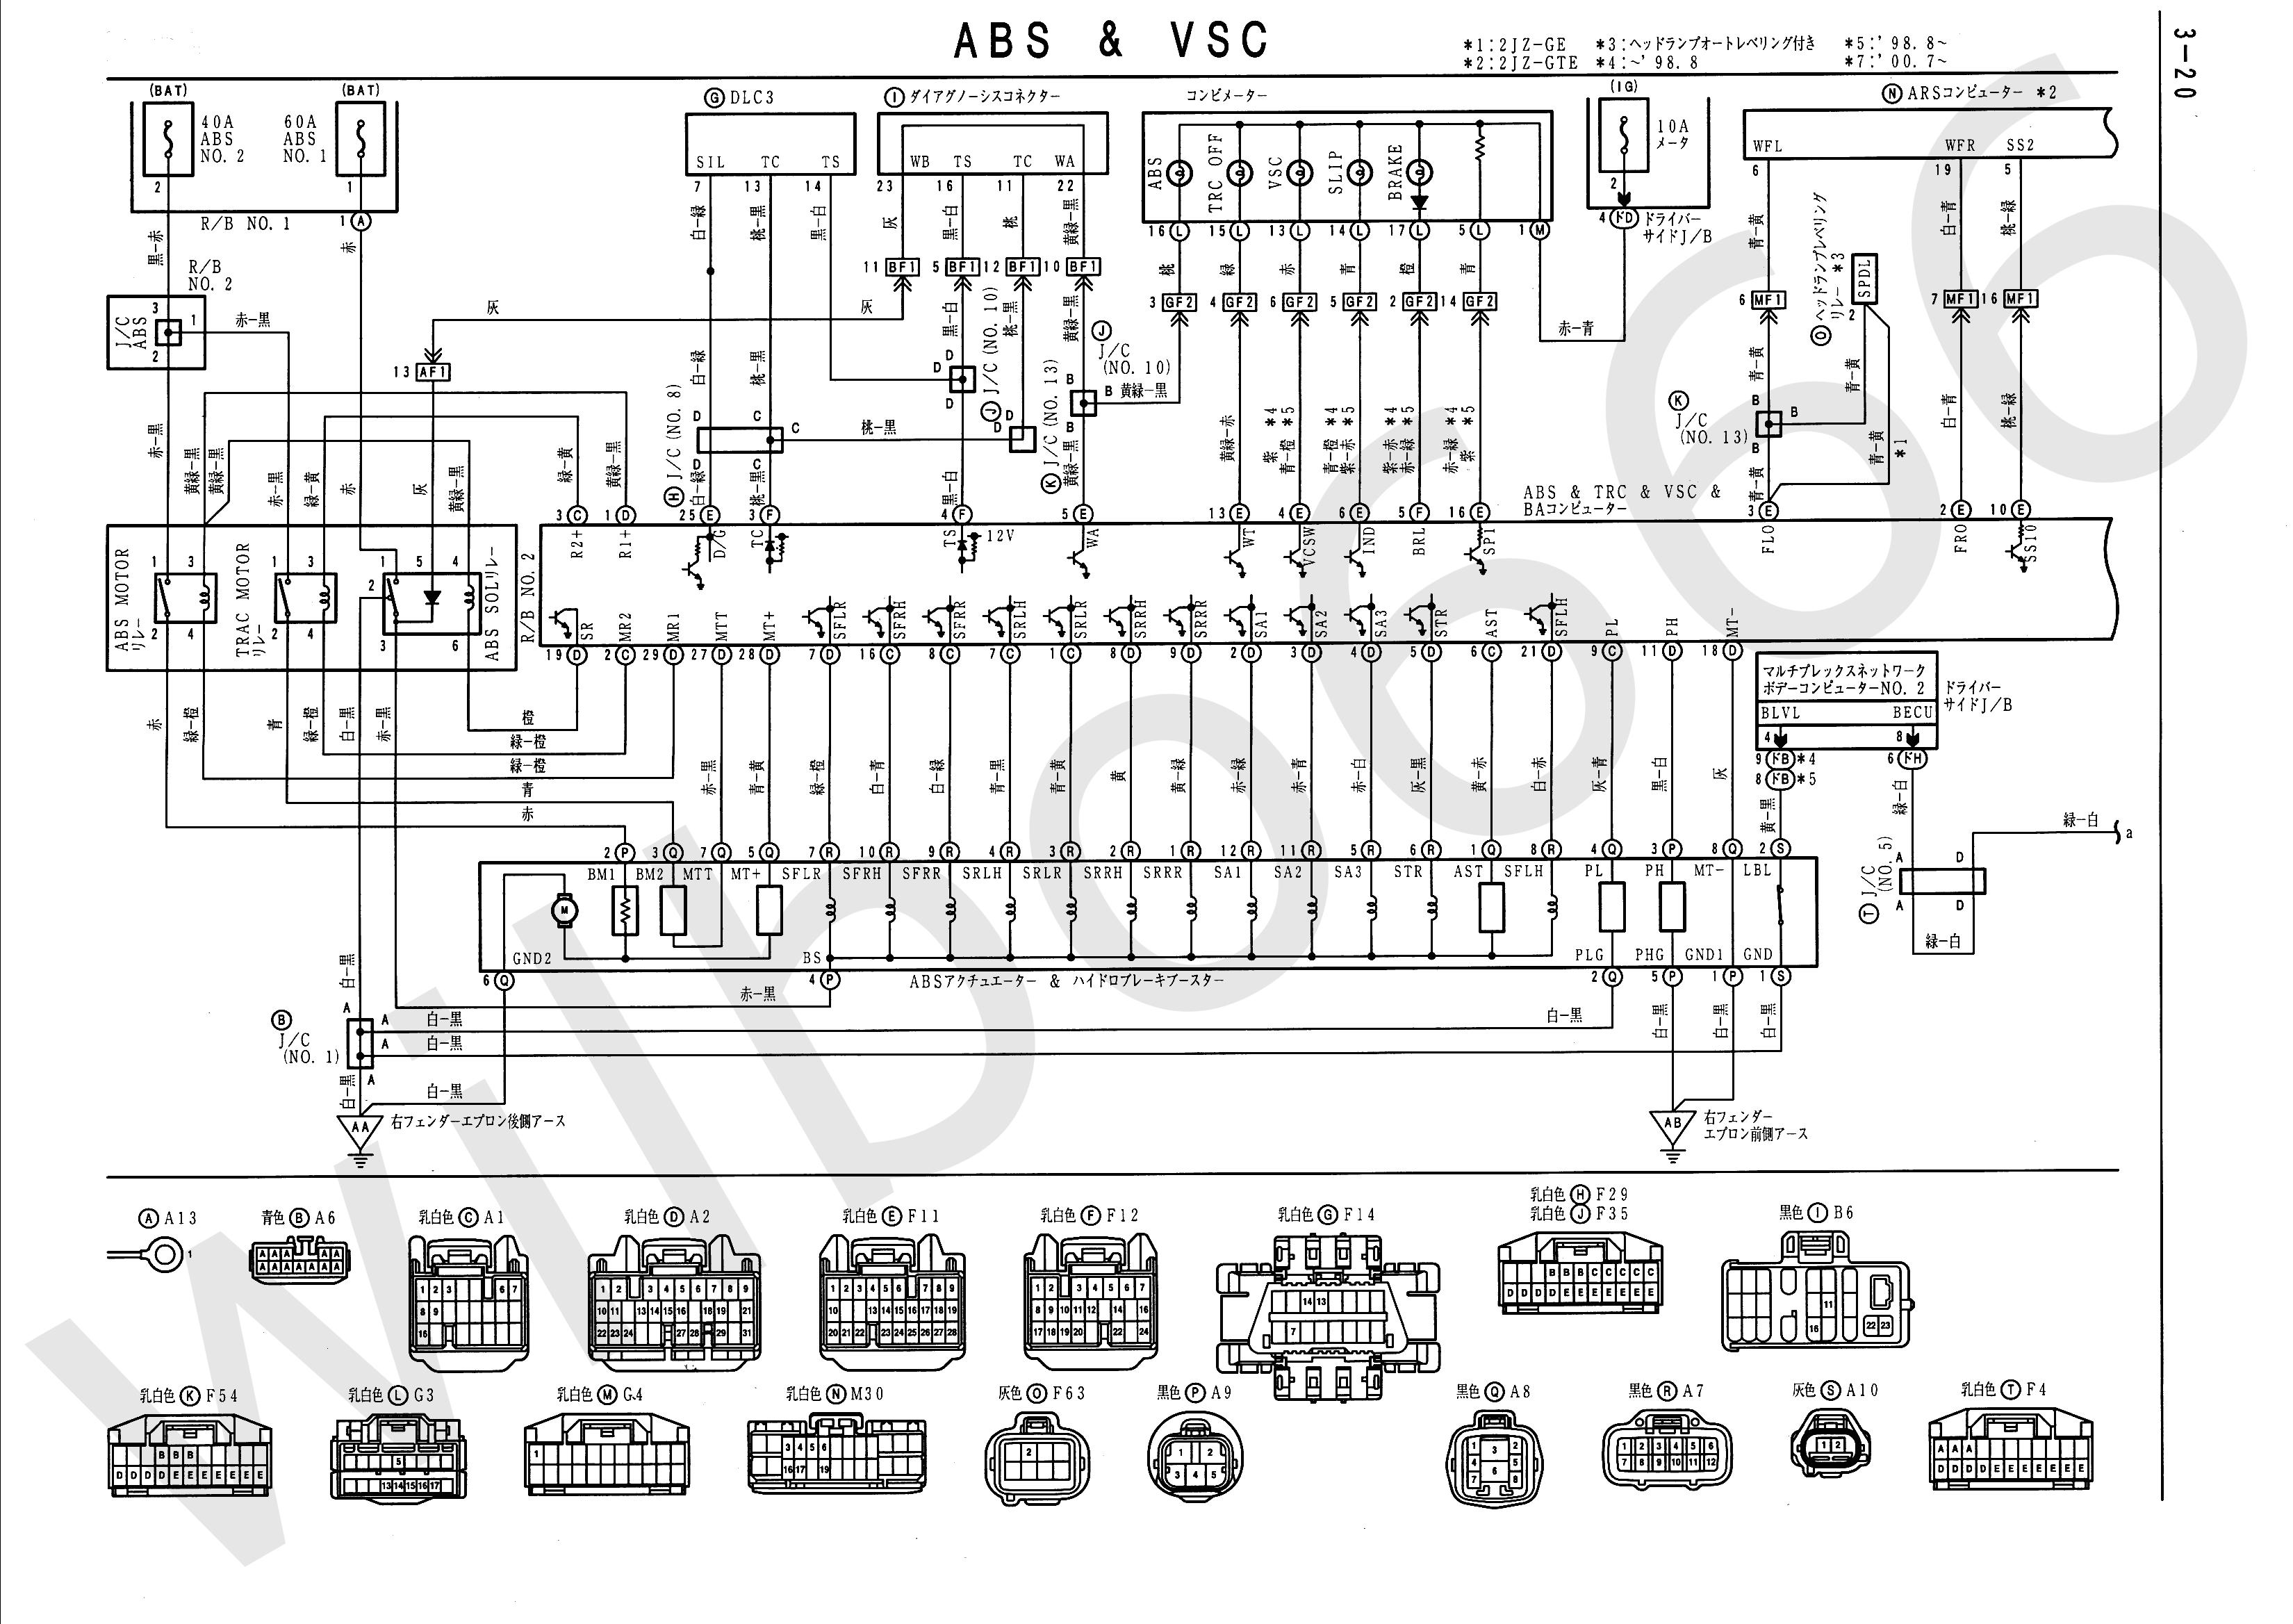 1jz vvti wiring diagram pdf